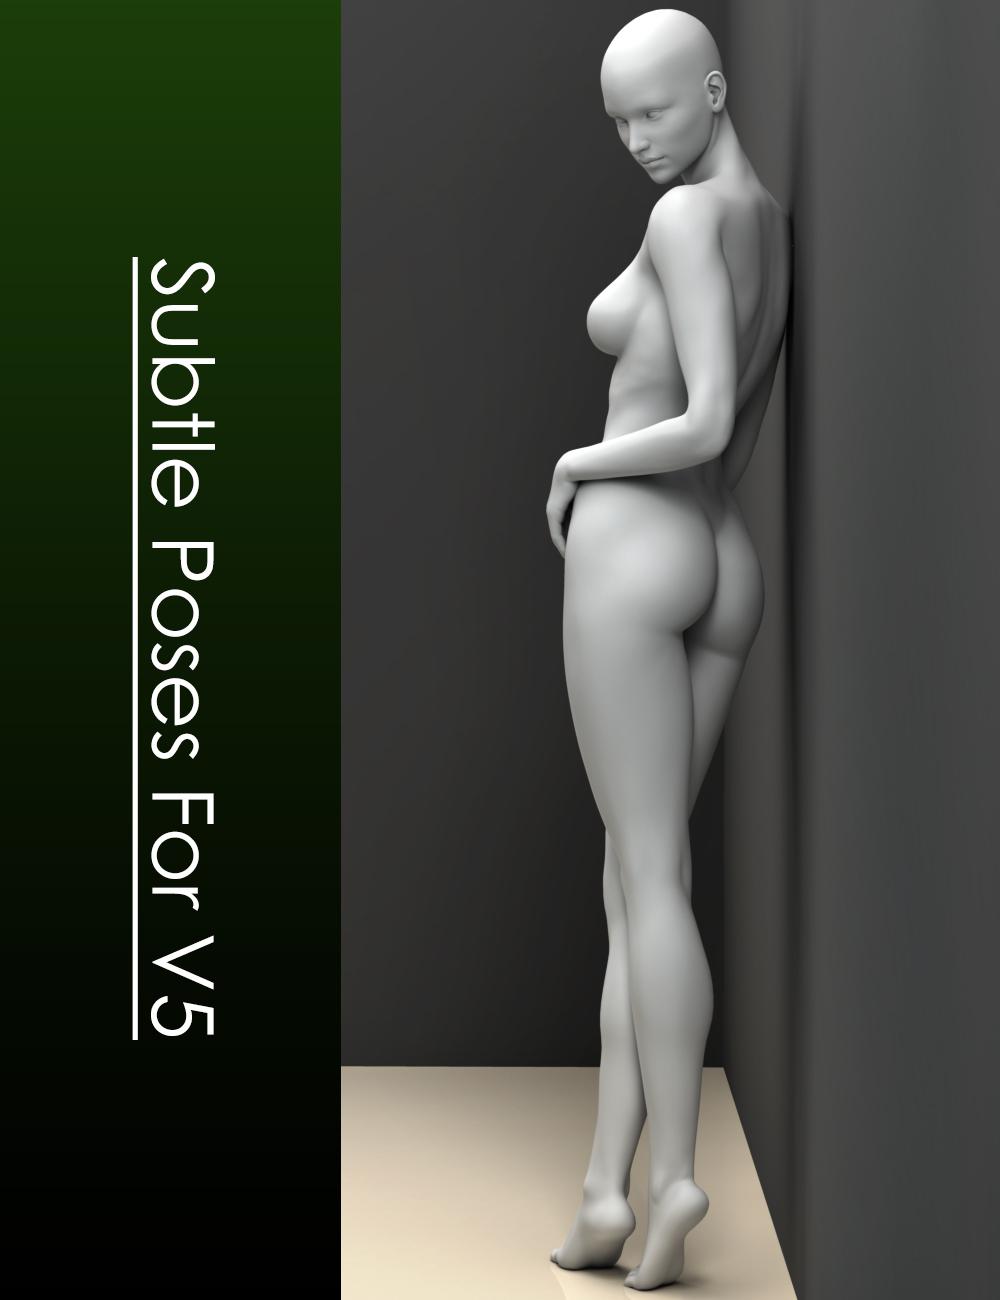 Subtle Poses for Victoria 5 by: Elele, 3D Models by Daz 3D